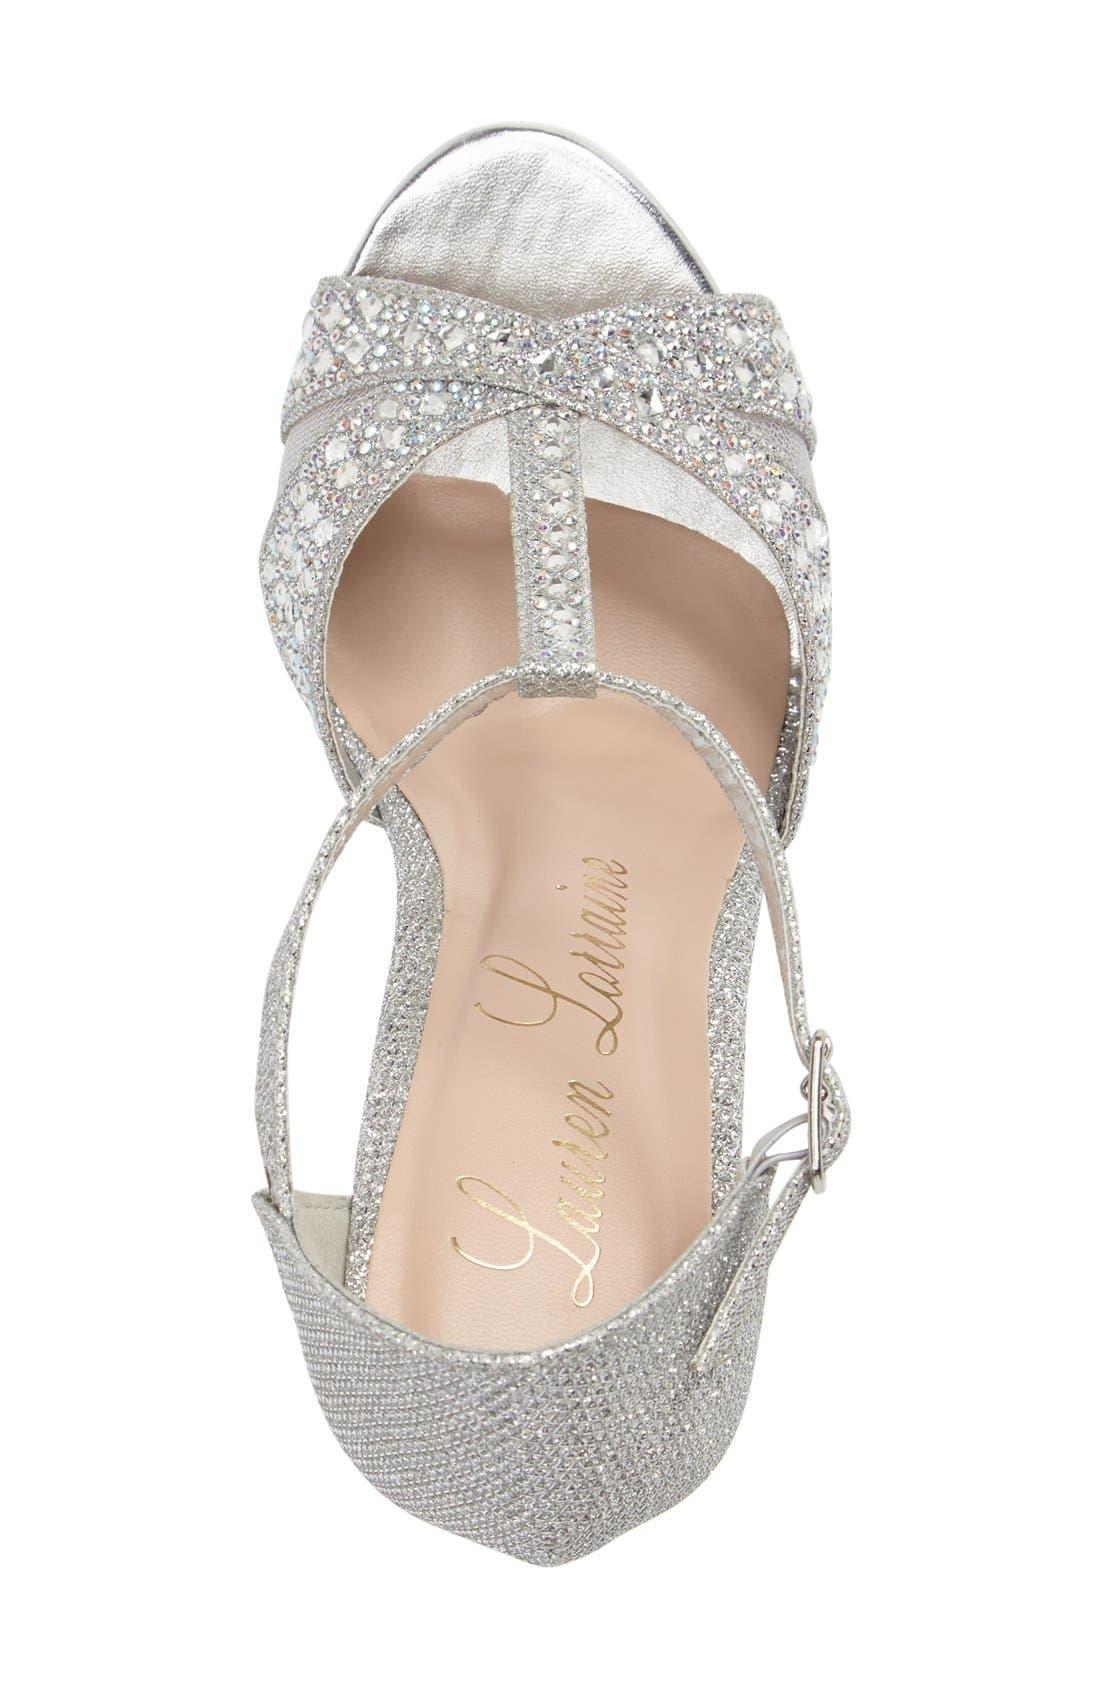 Alternate Image 3  - Lauren Lorraine Ness Crystal Embellished Wedge Sandal (Women)